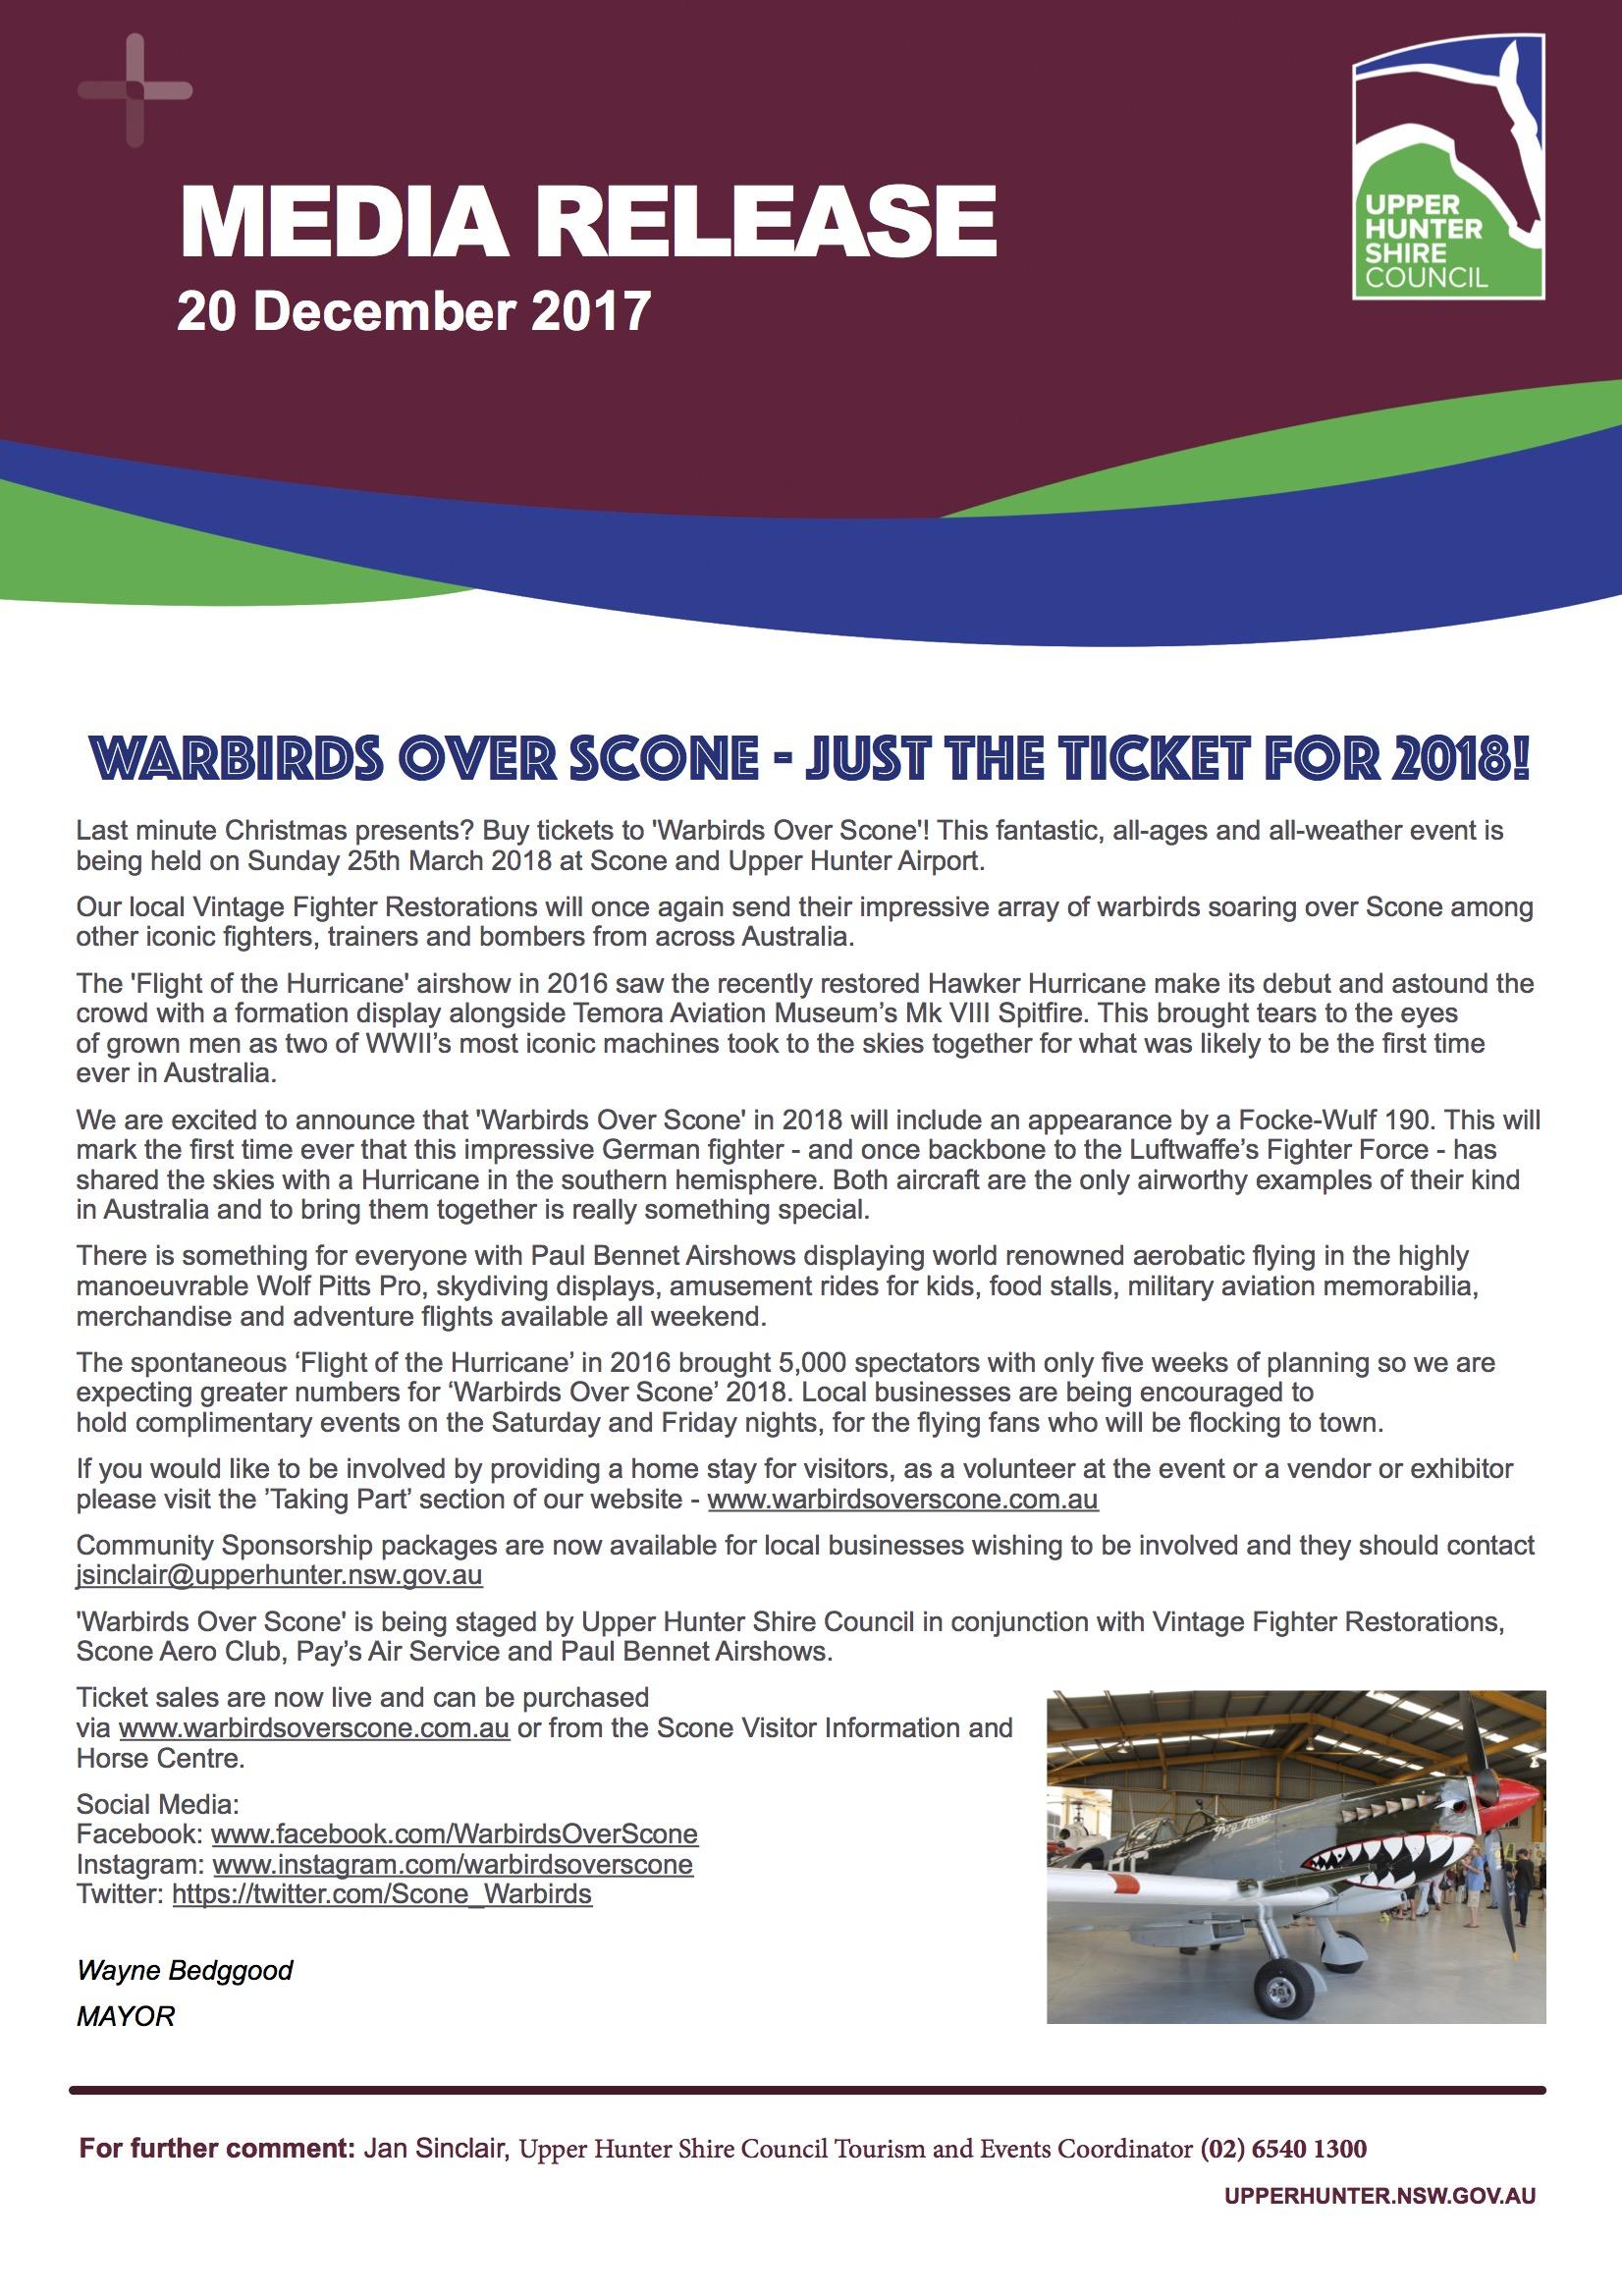 Media Release - Warbirds Over Scone just the ticket for 2018 - December 2017.jpg